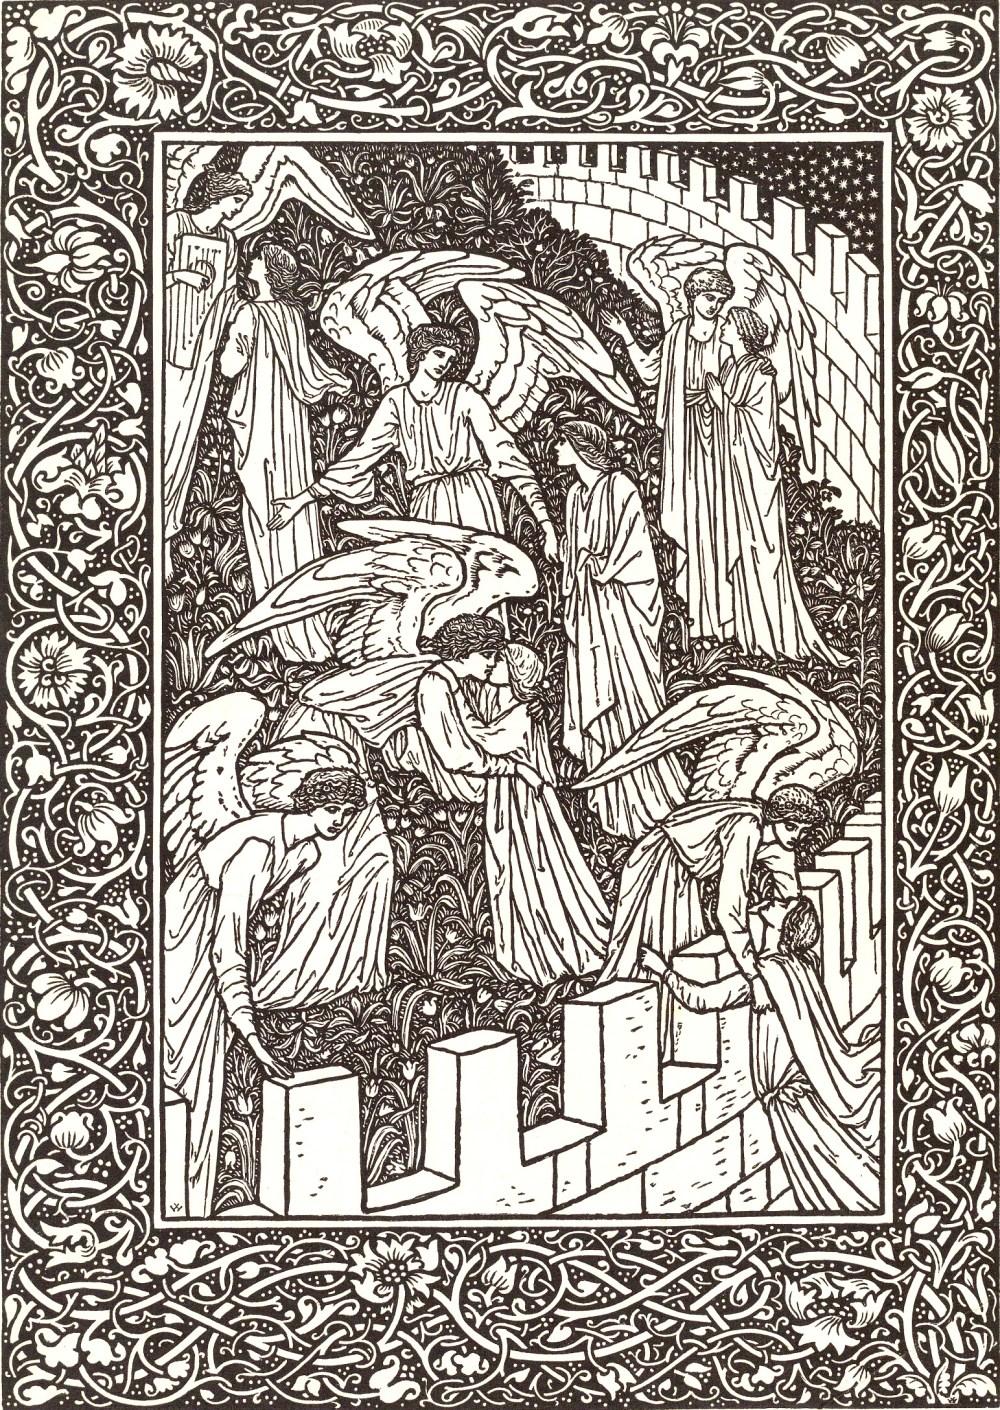 illustrations-arts-and-crafts-vieux-livre-golden-legend